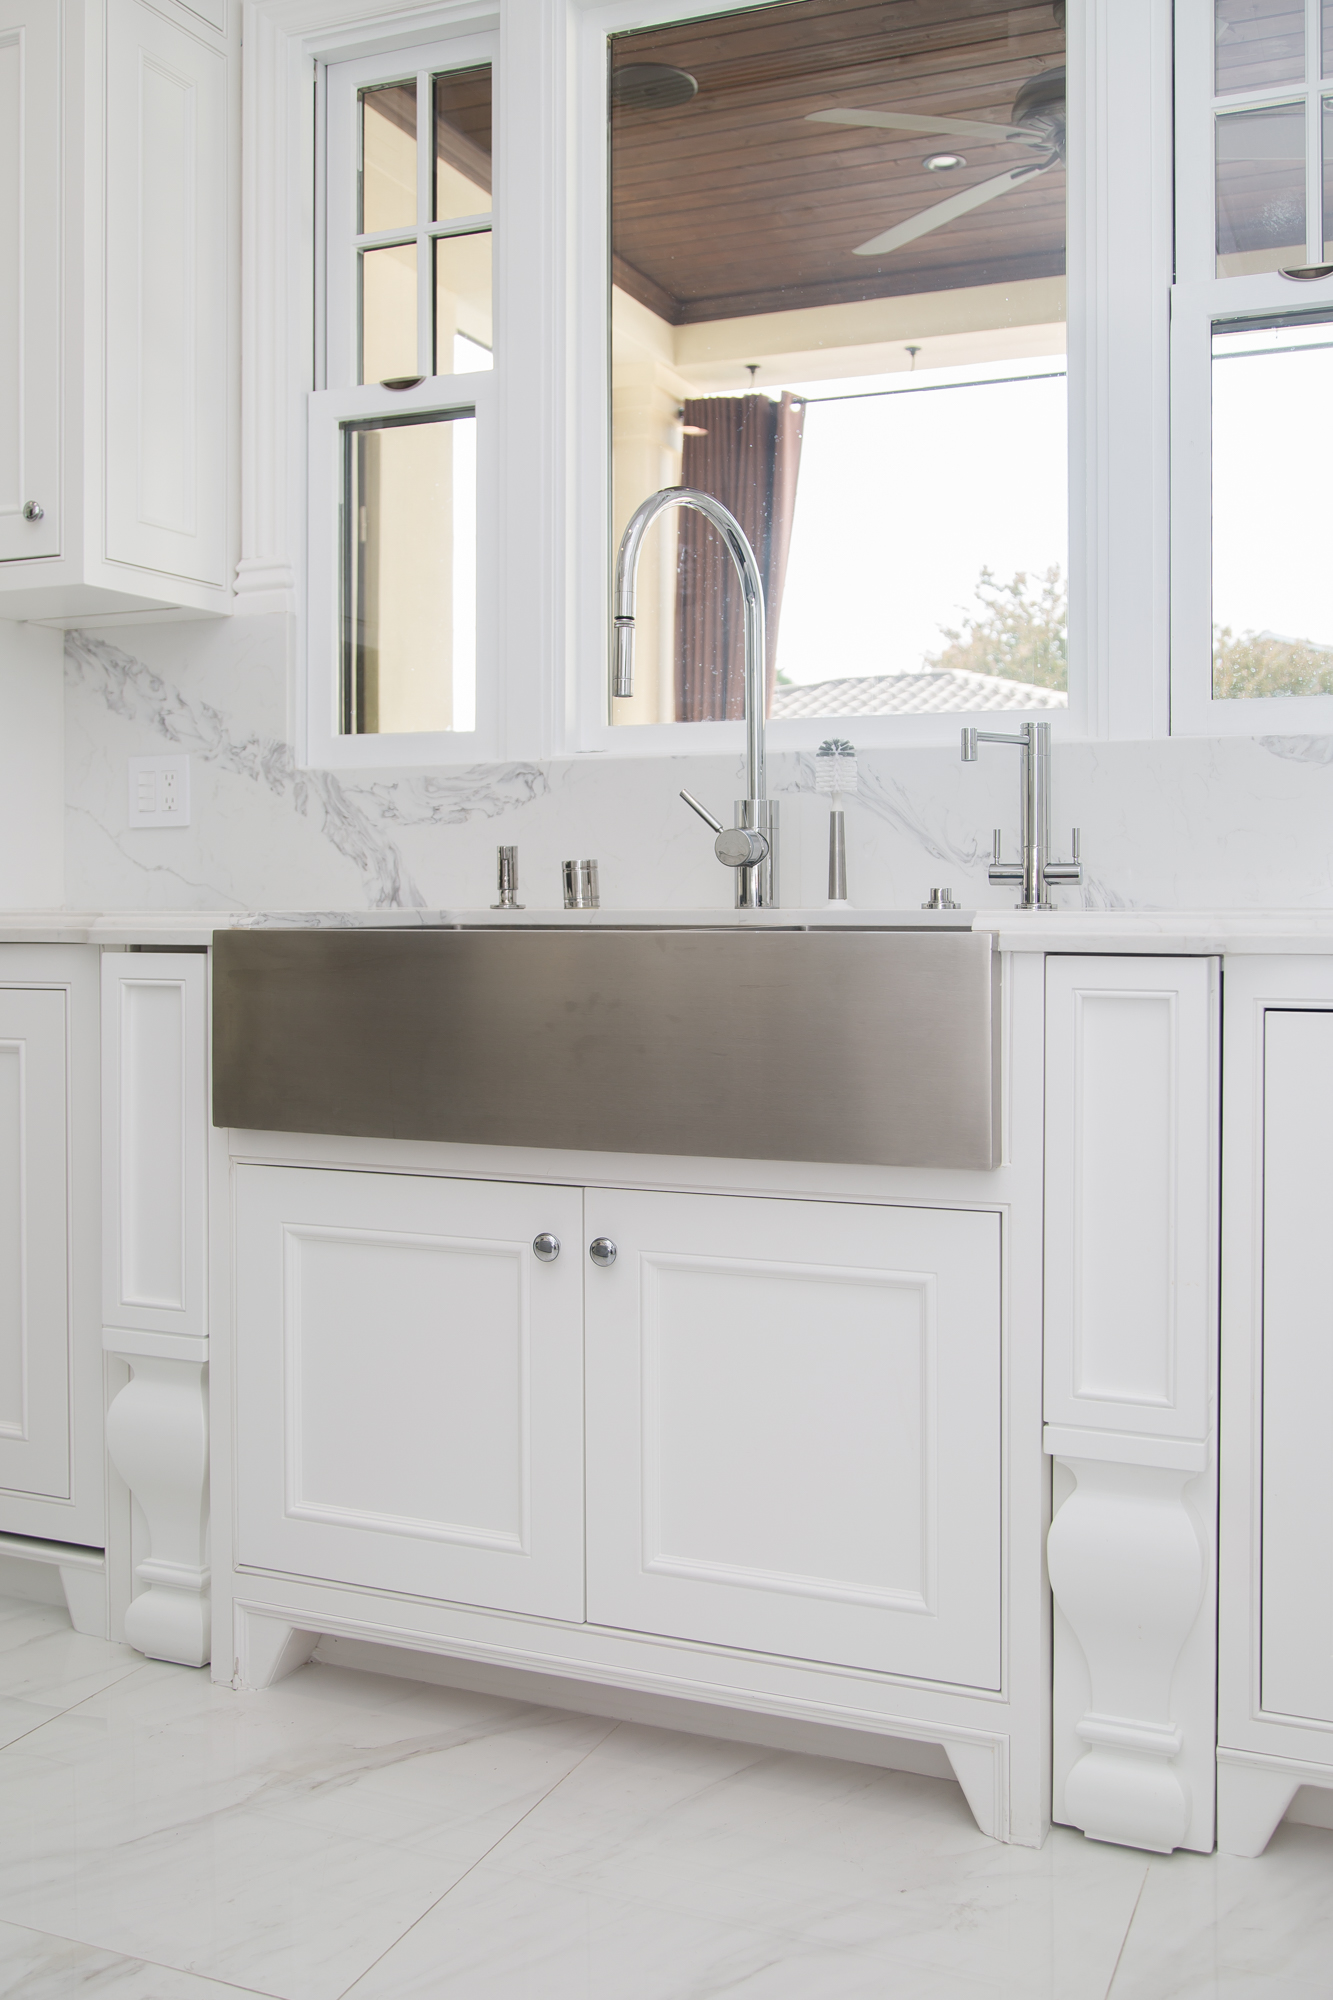 Custom Kitchen & Vanity Cabinets (Project 107) - RTA Cabinet Work